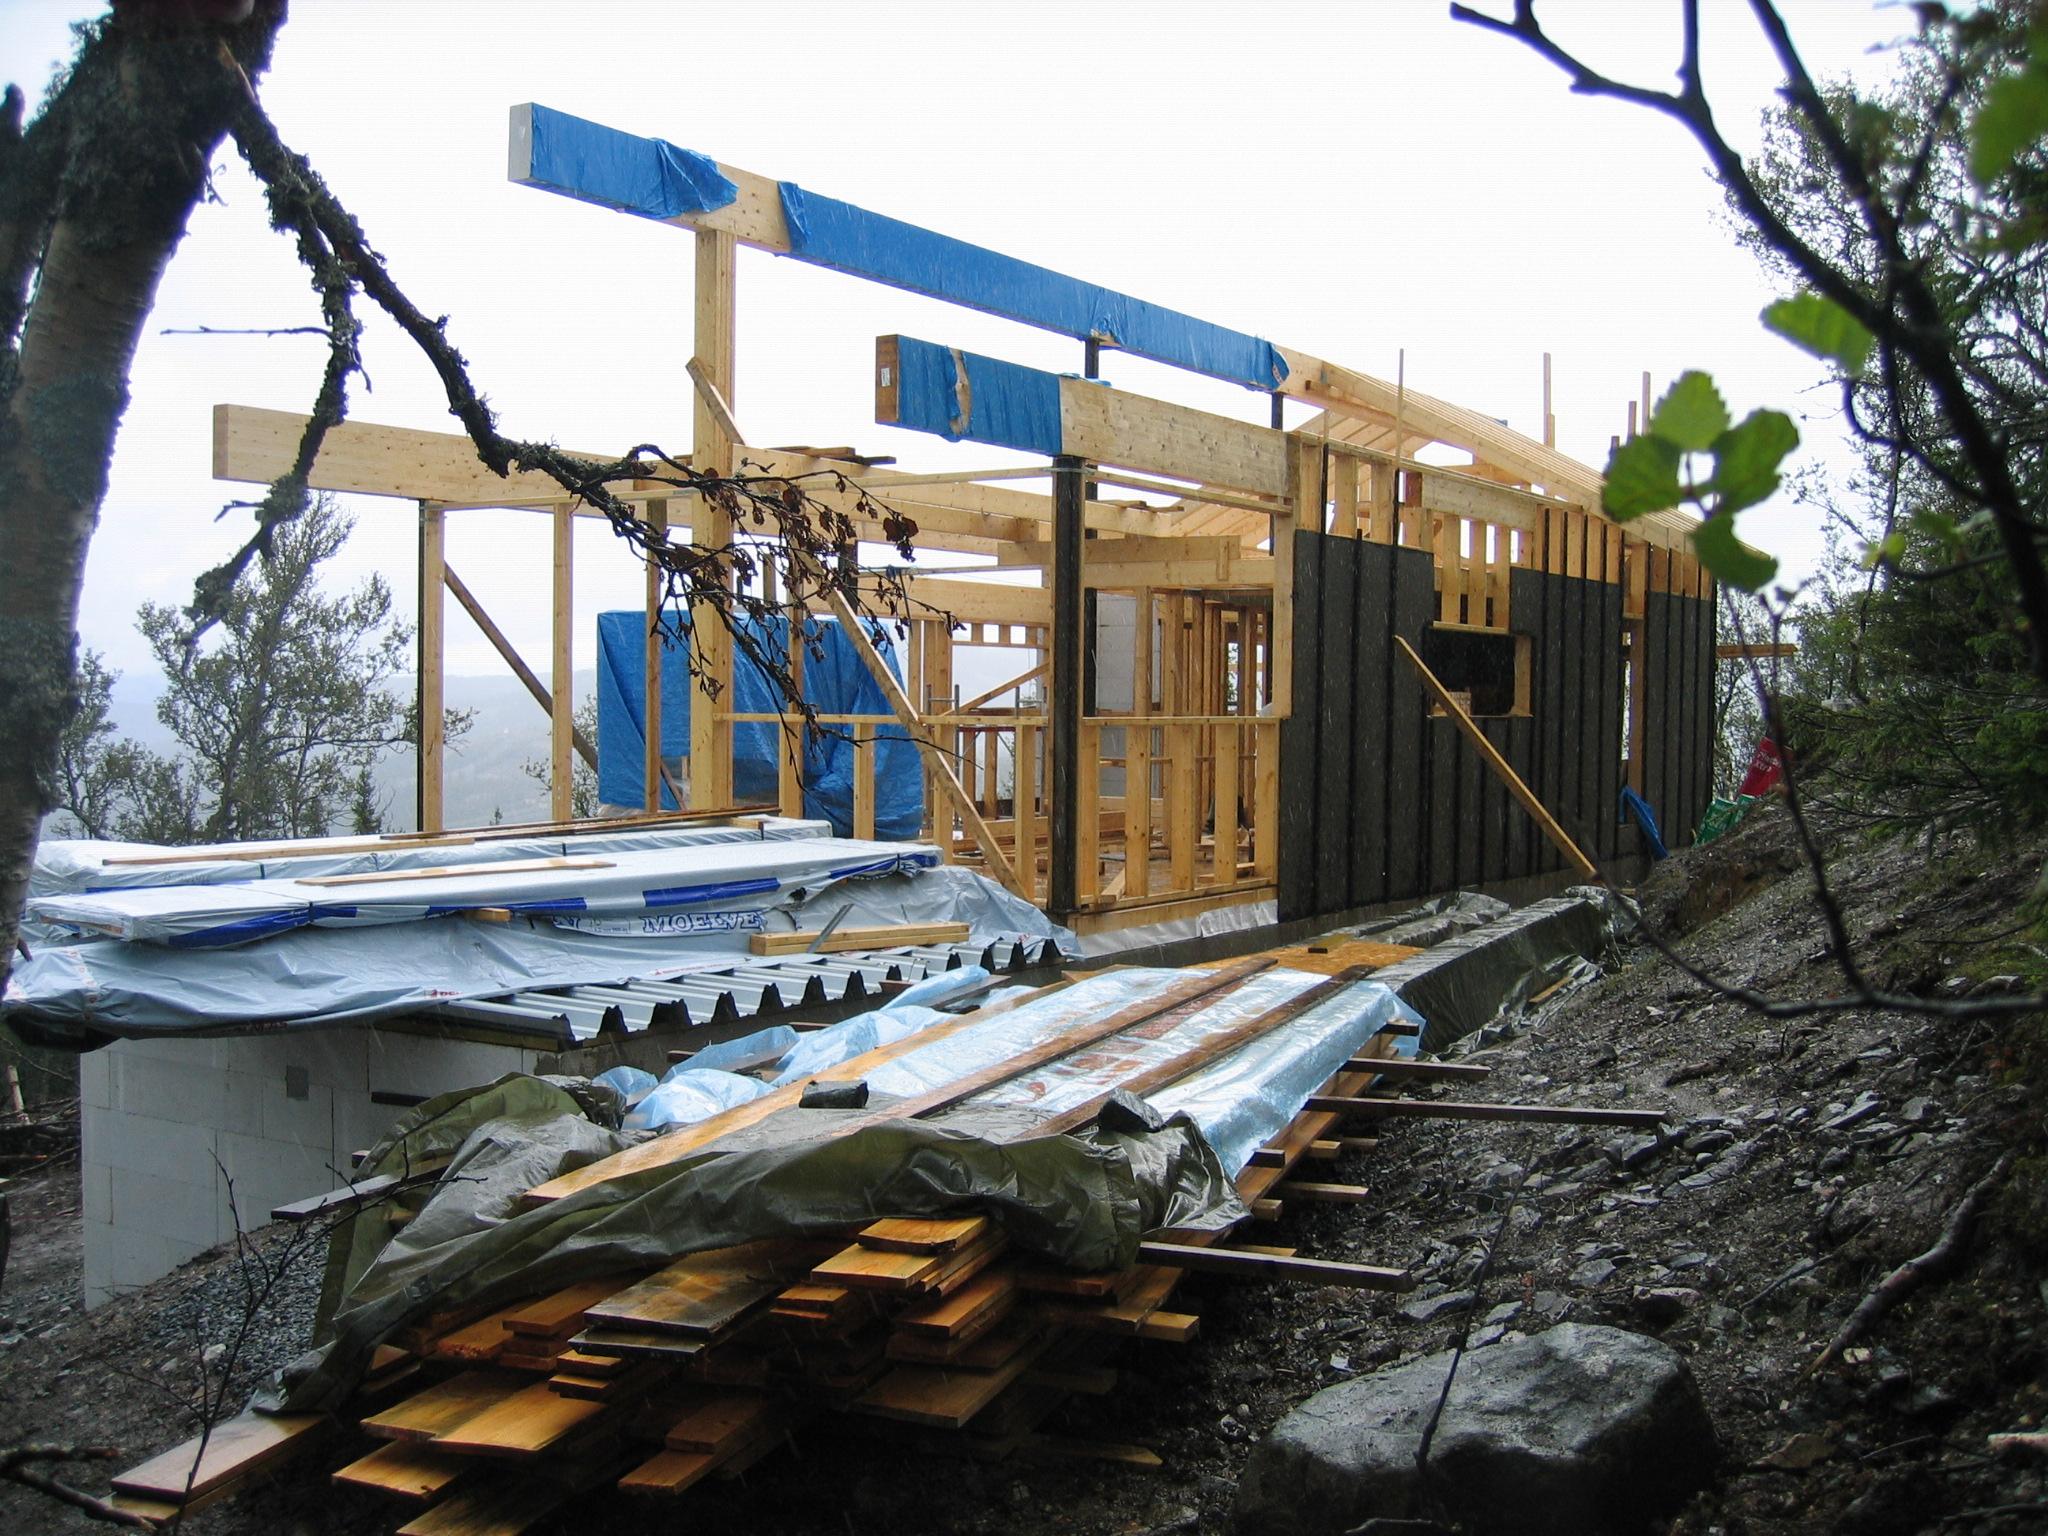 Når taket tar form, tar også bygget form. Ikke lenger planker i alle retninger, men en bygning...